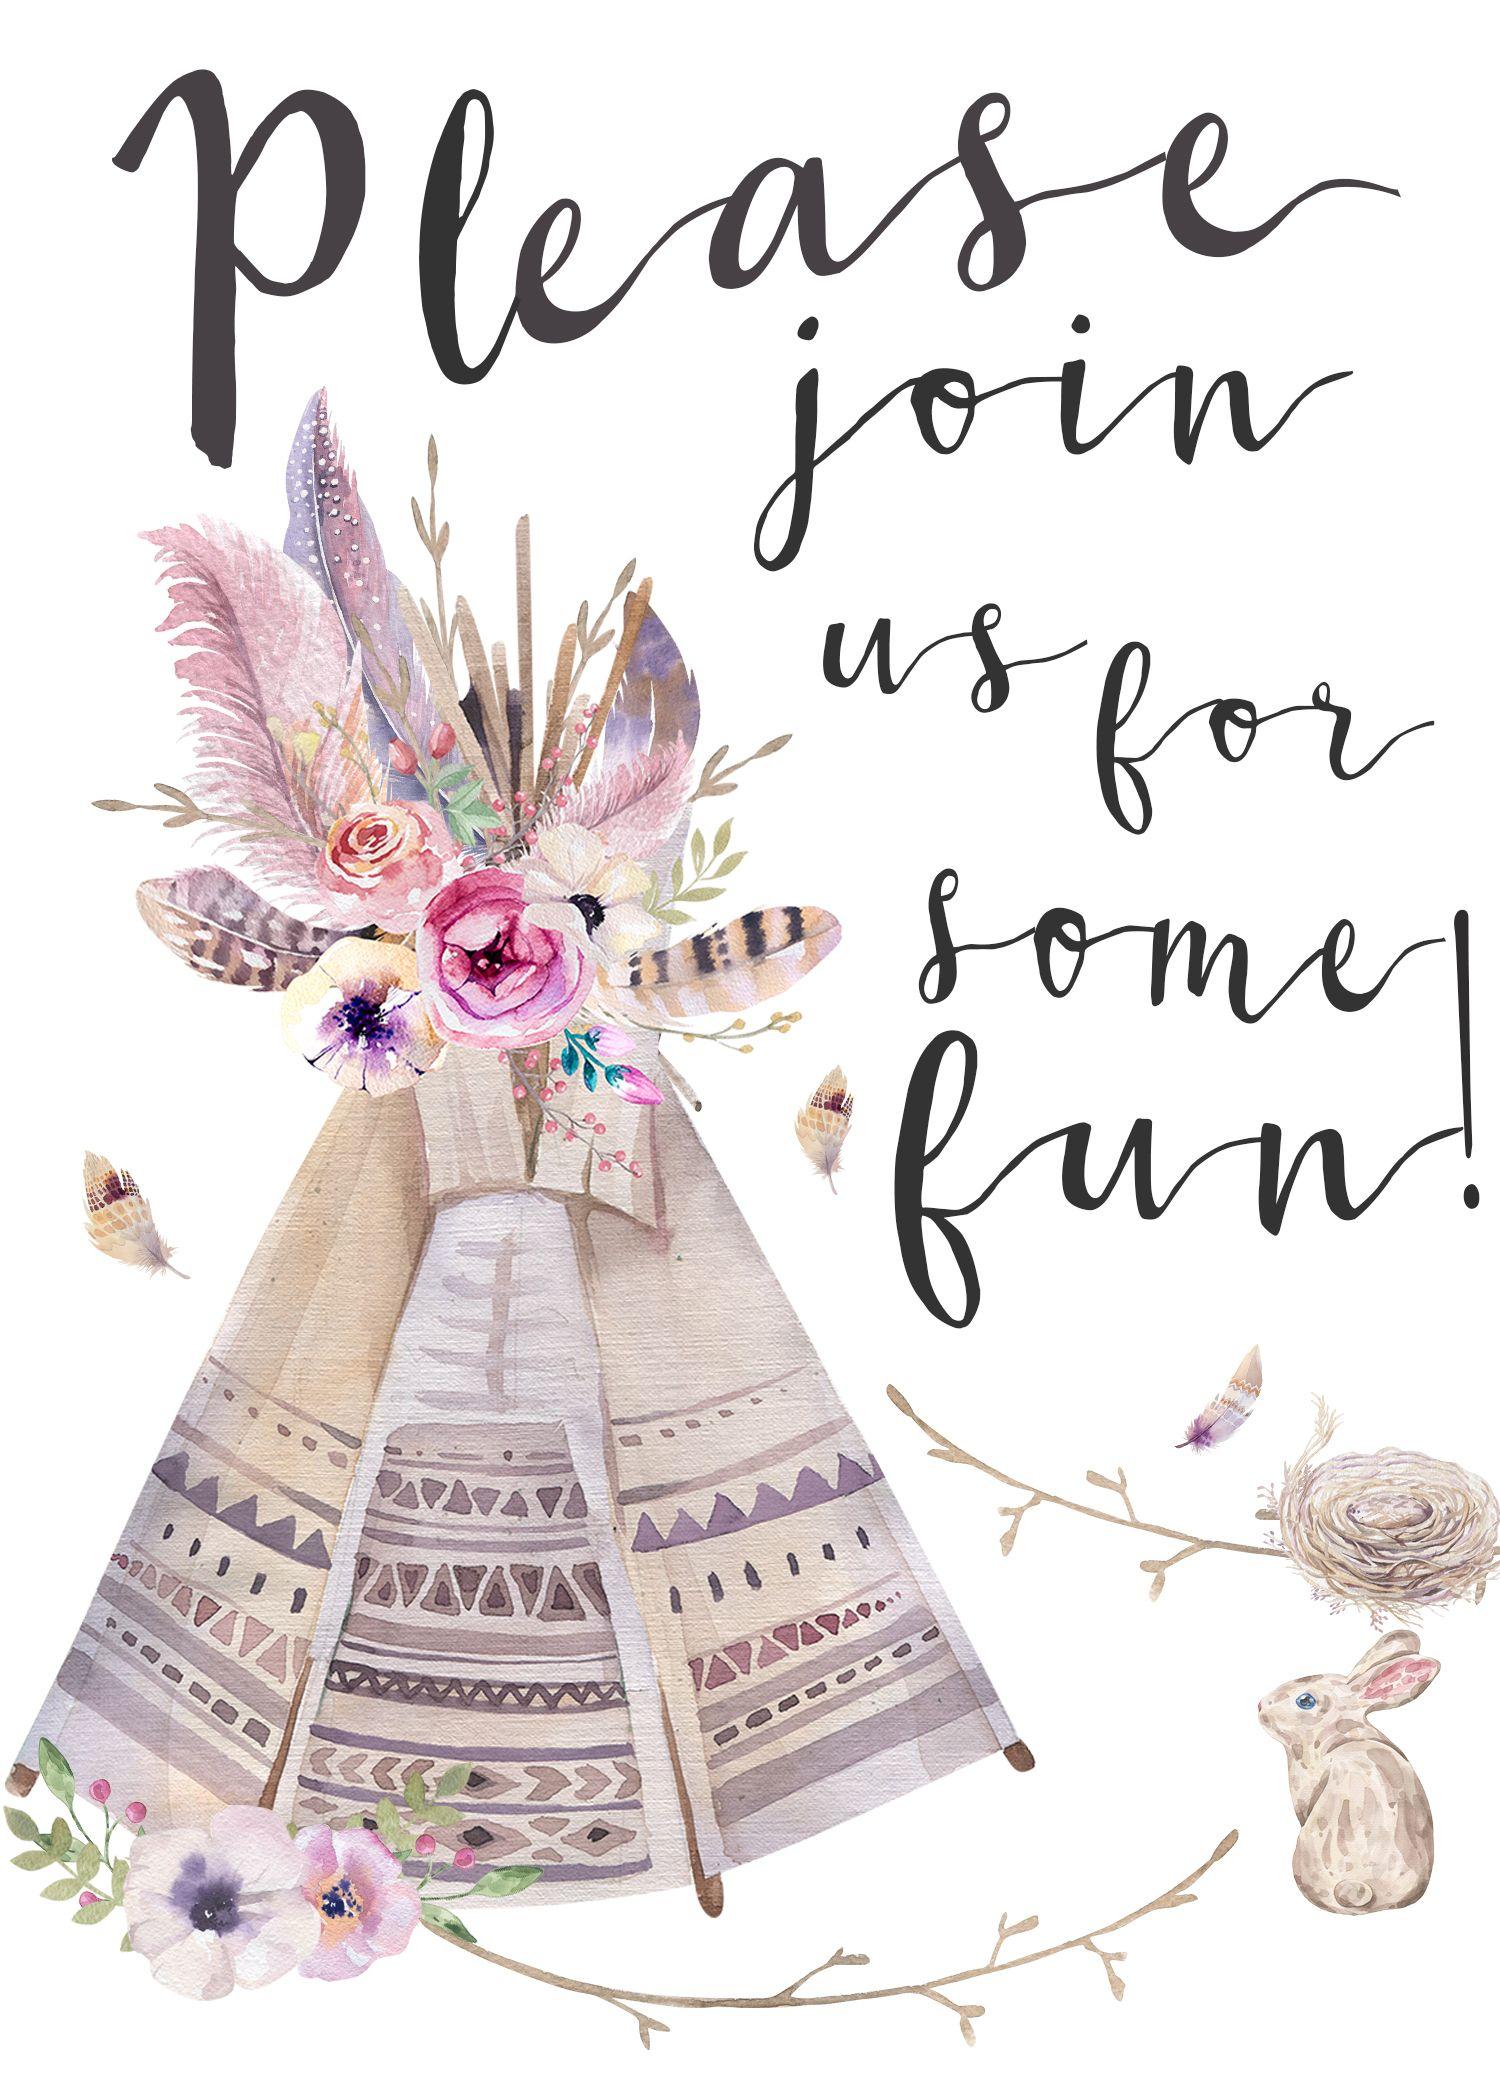 Boho Style Invitation (It's Free!) | Summer Party | Boho, Free - Free Printable Teepee